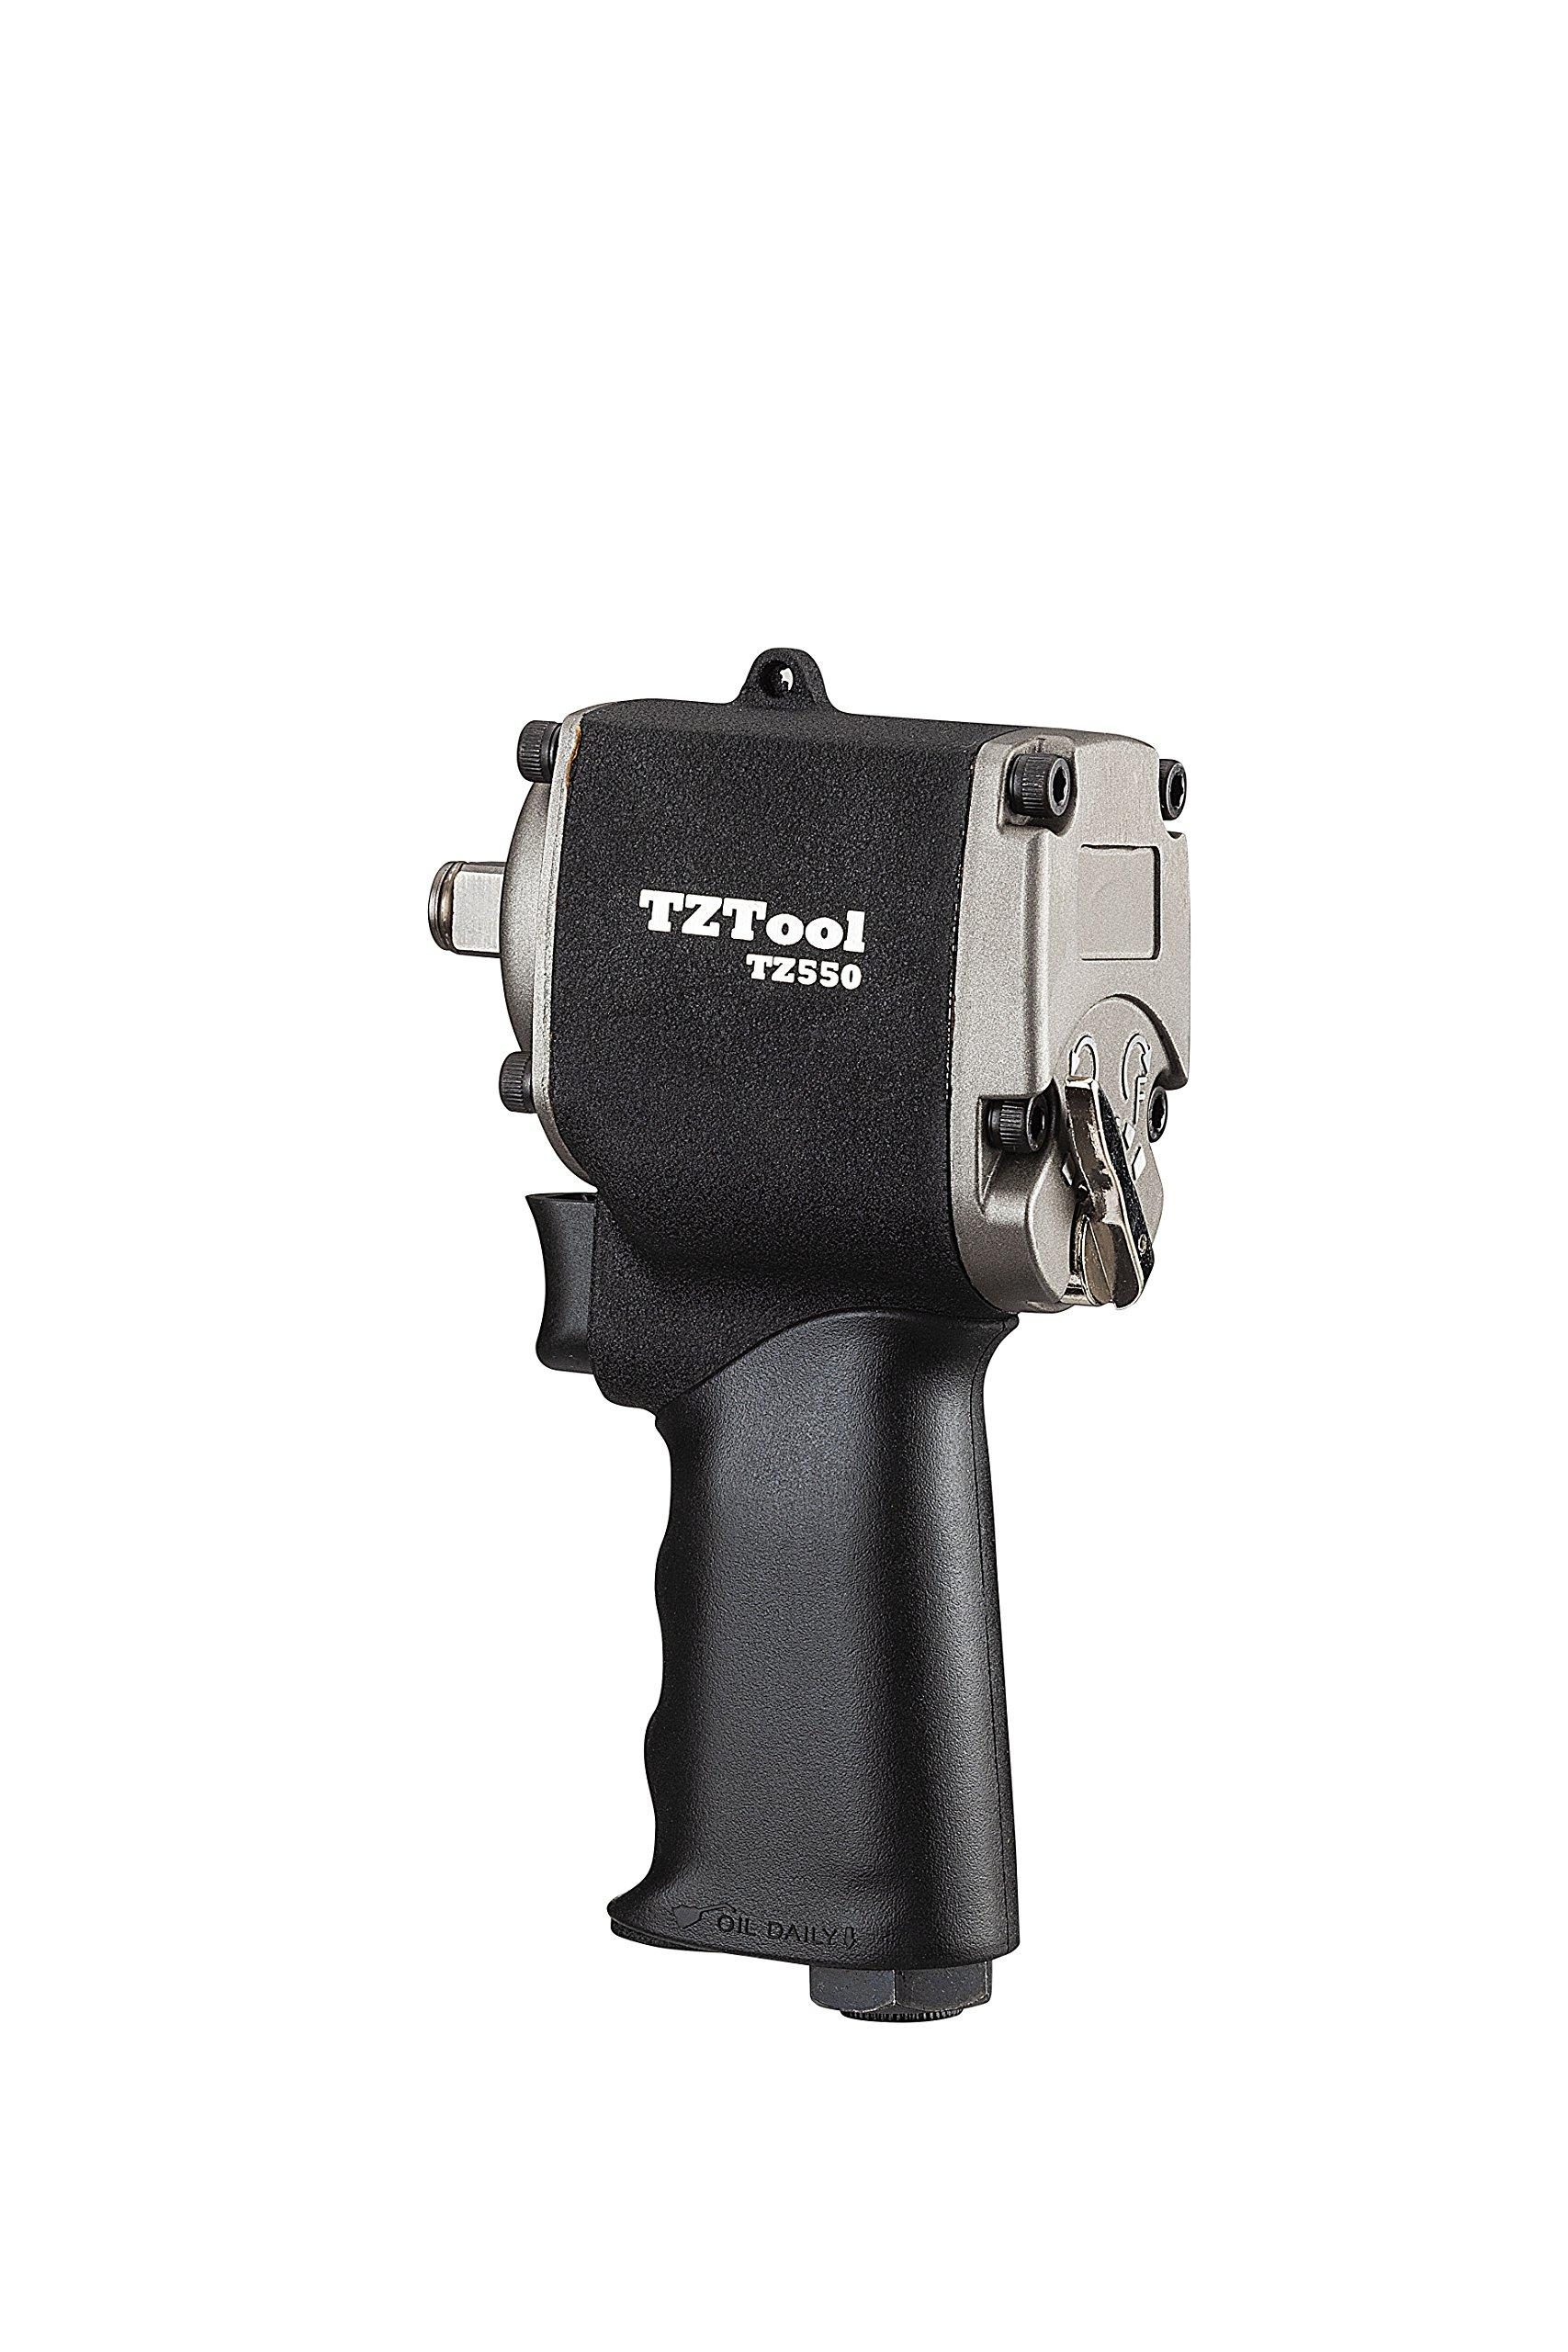 TZTOOL mini 1/2'' air impact wrench